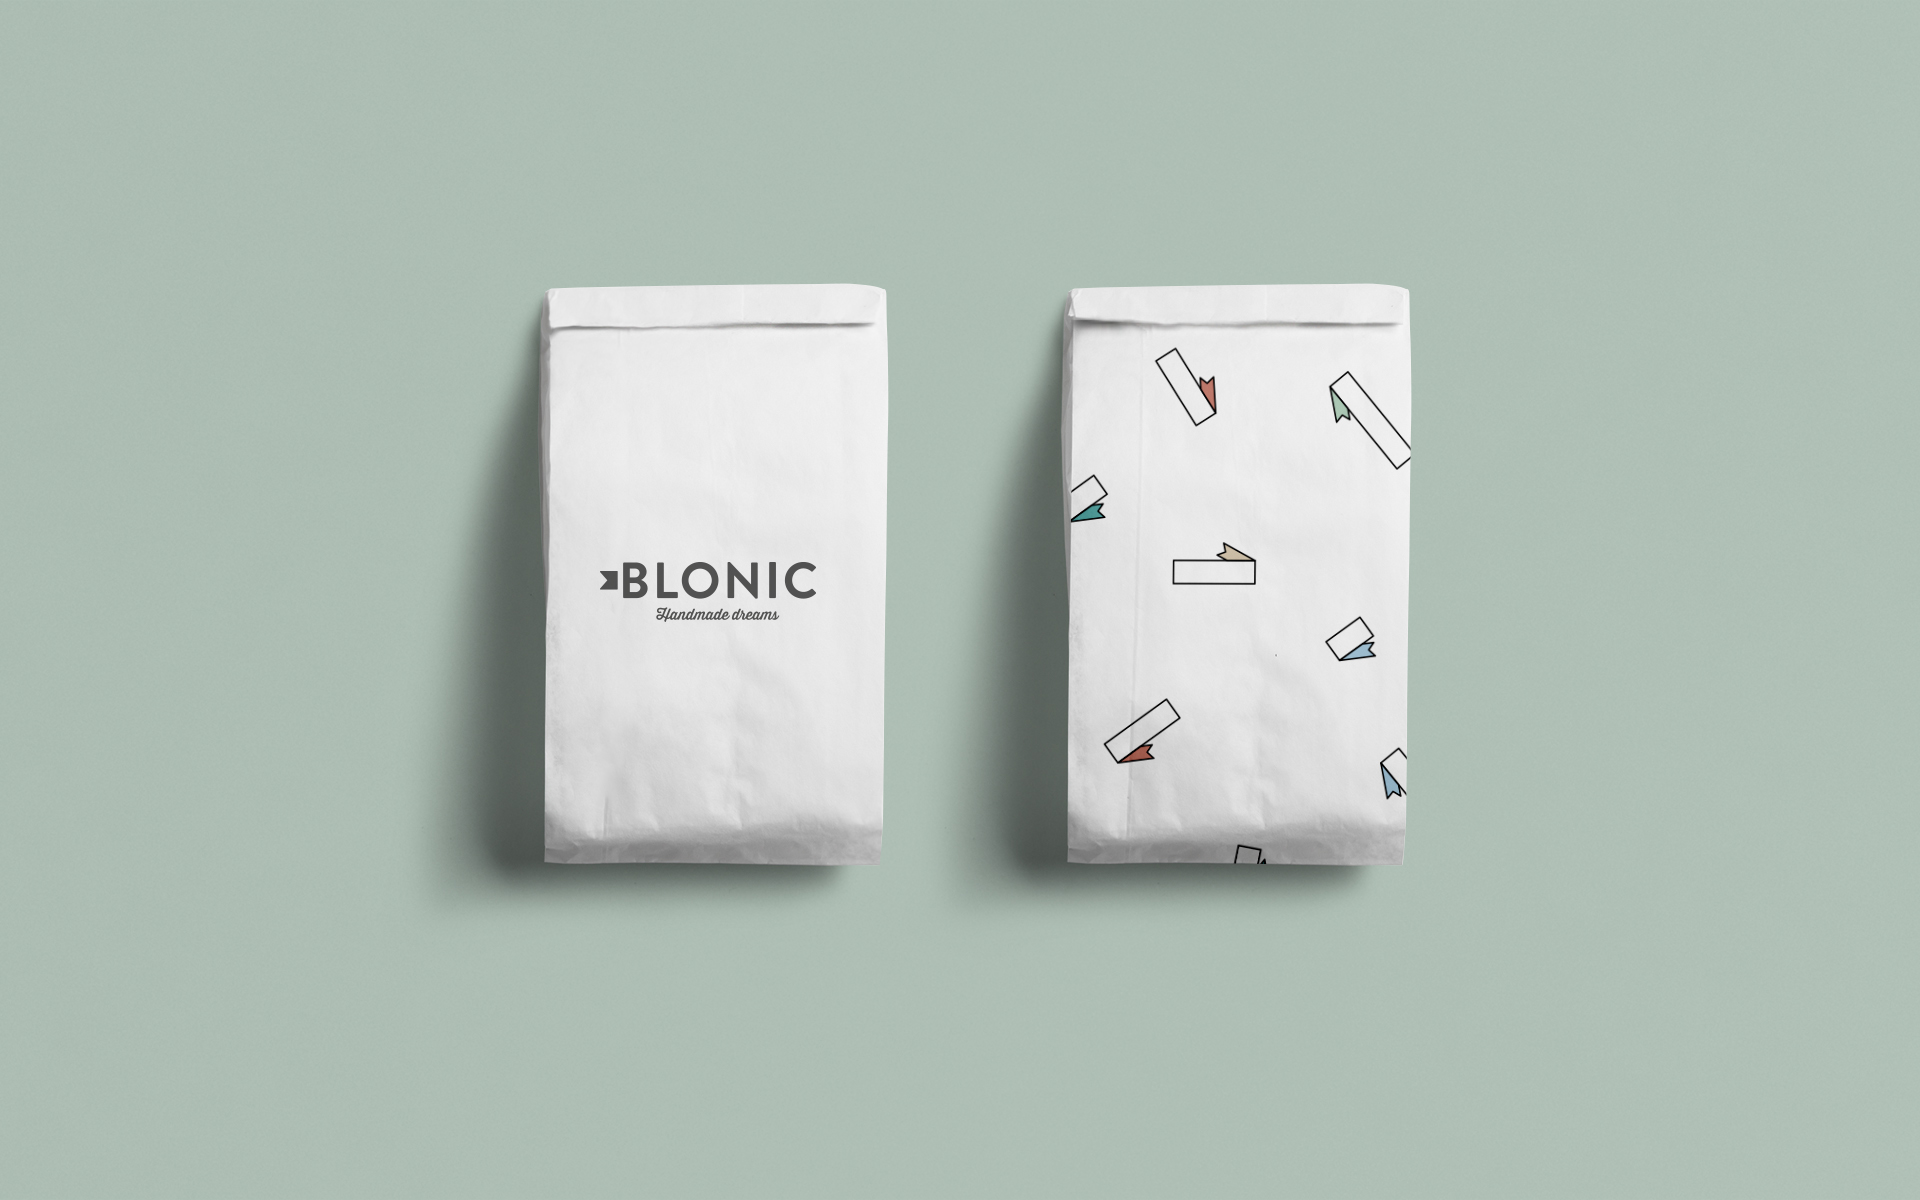 Blonic-05-Bolsas2.jpg